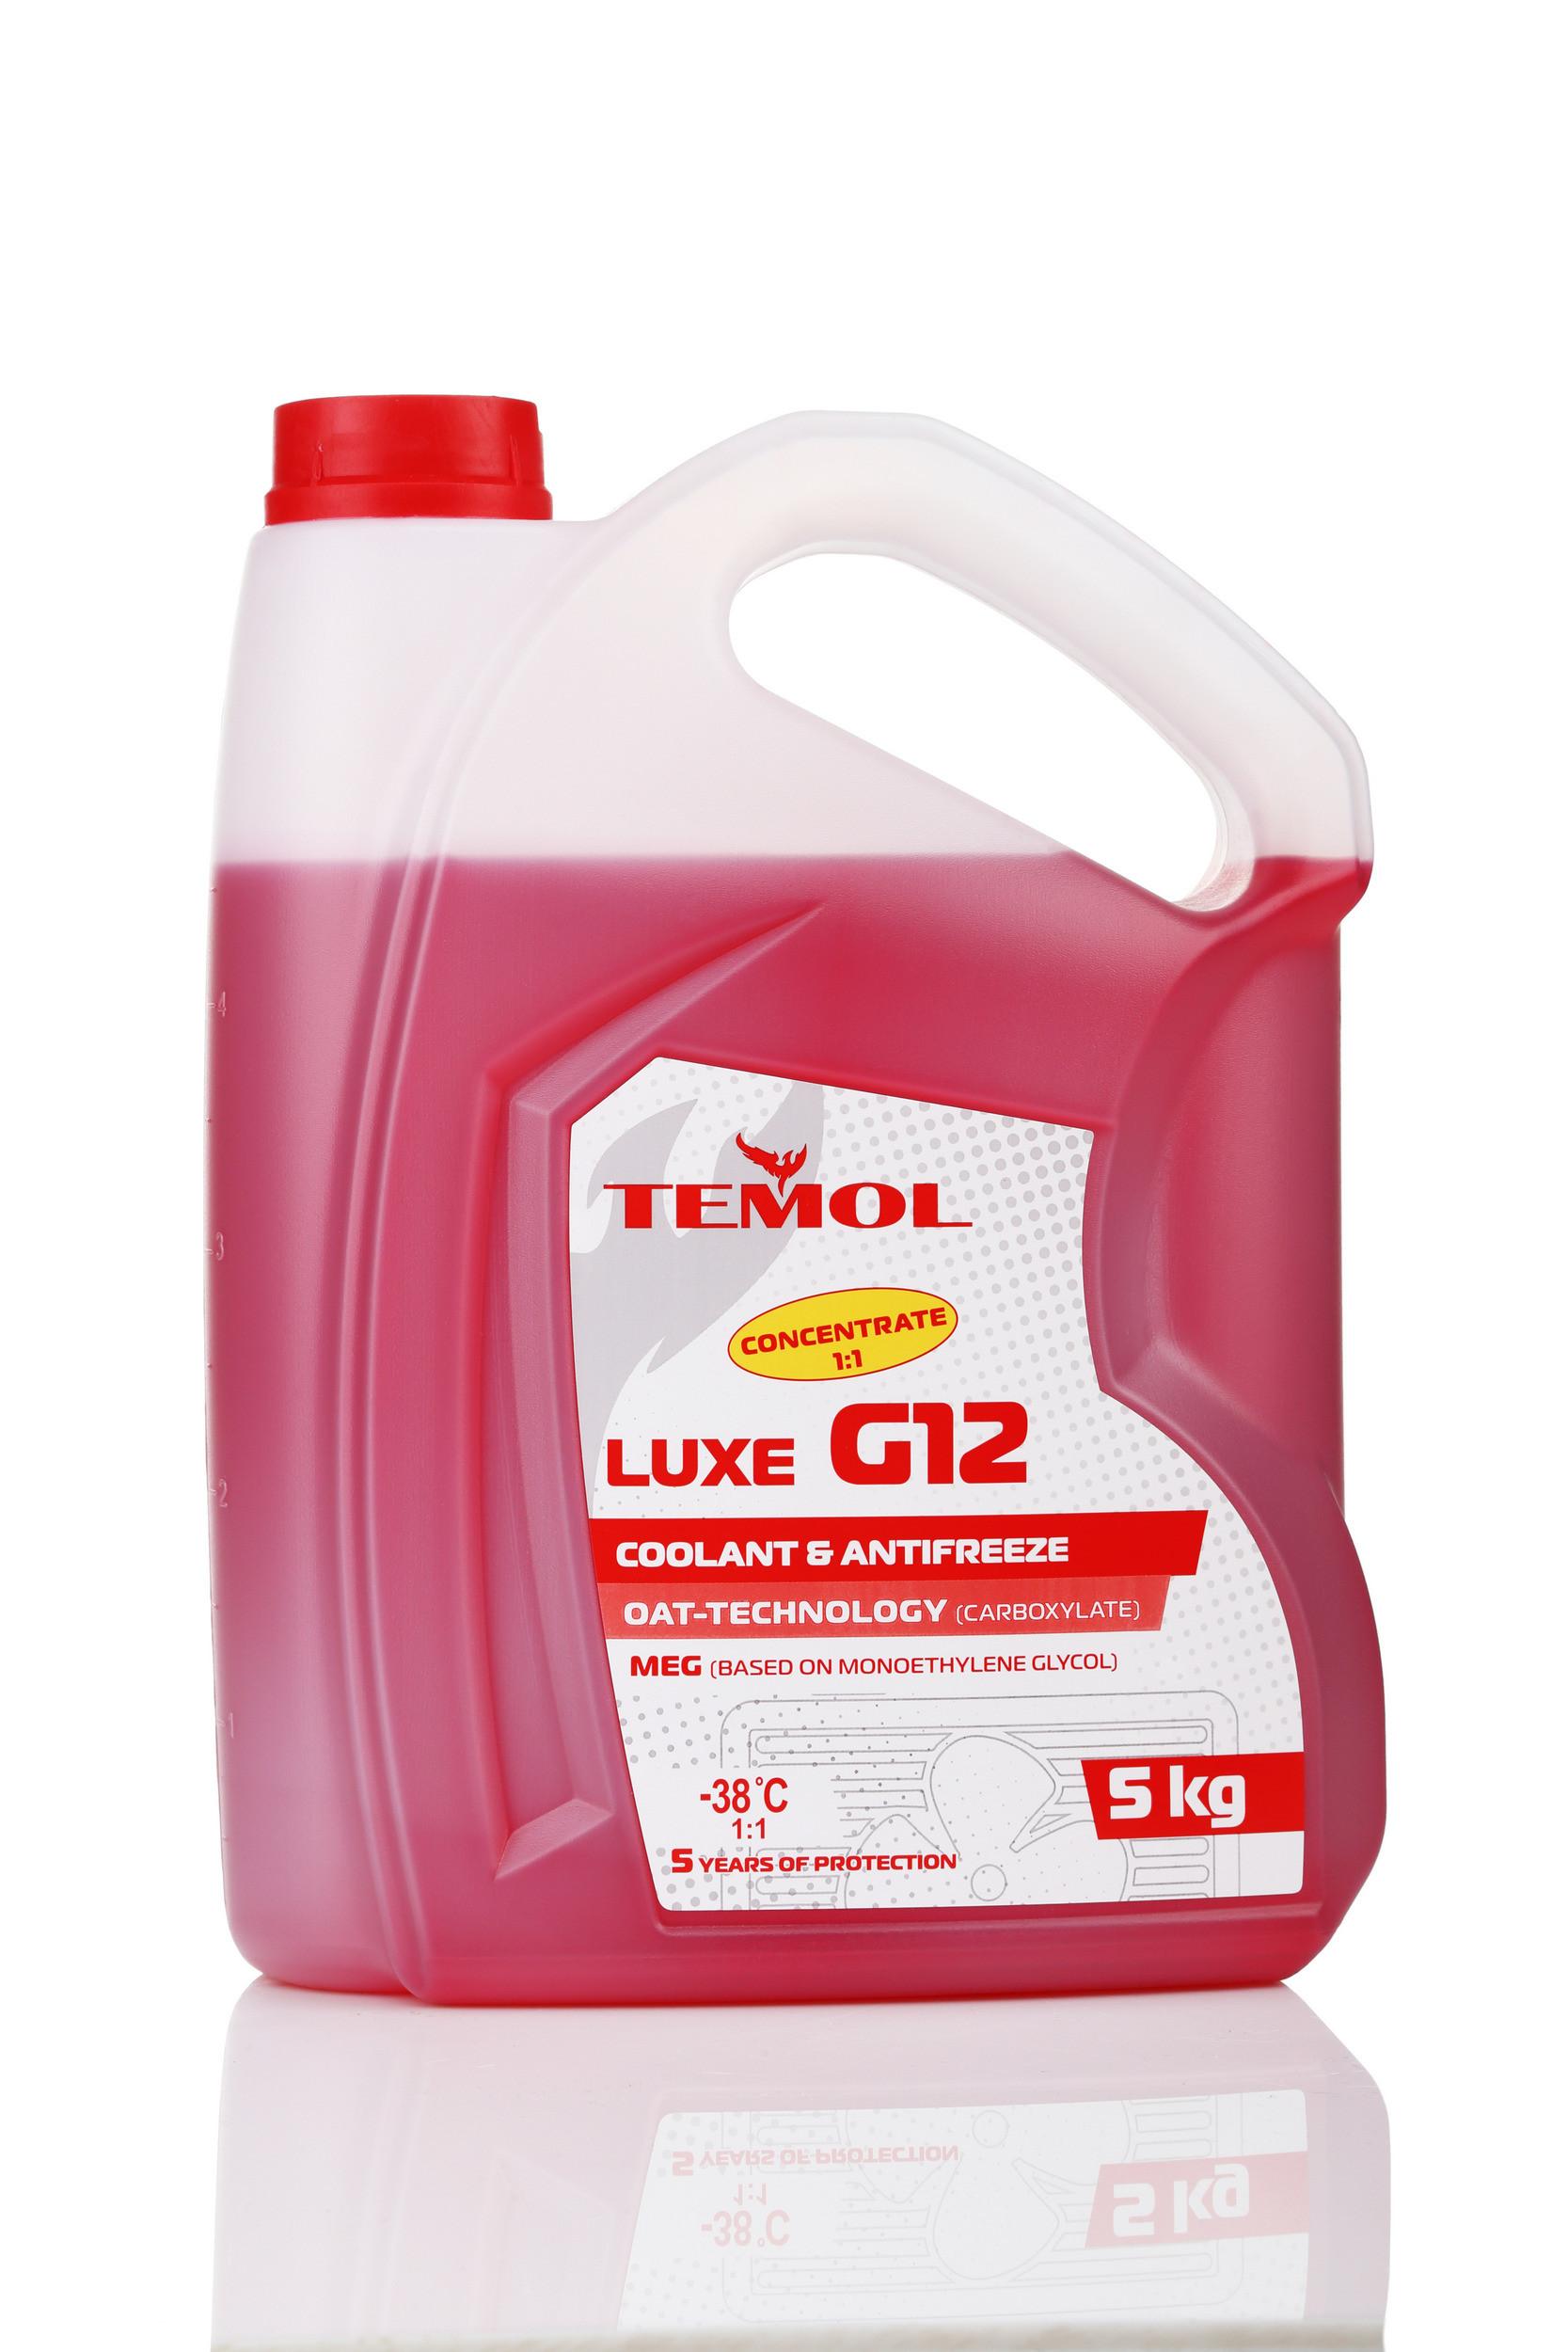 TEMOL ANTIFREEZE LUXE CONCENTRATE G12 RED - 5L - Temol, официальный интернет-магазин